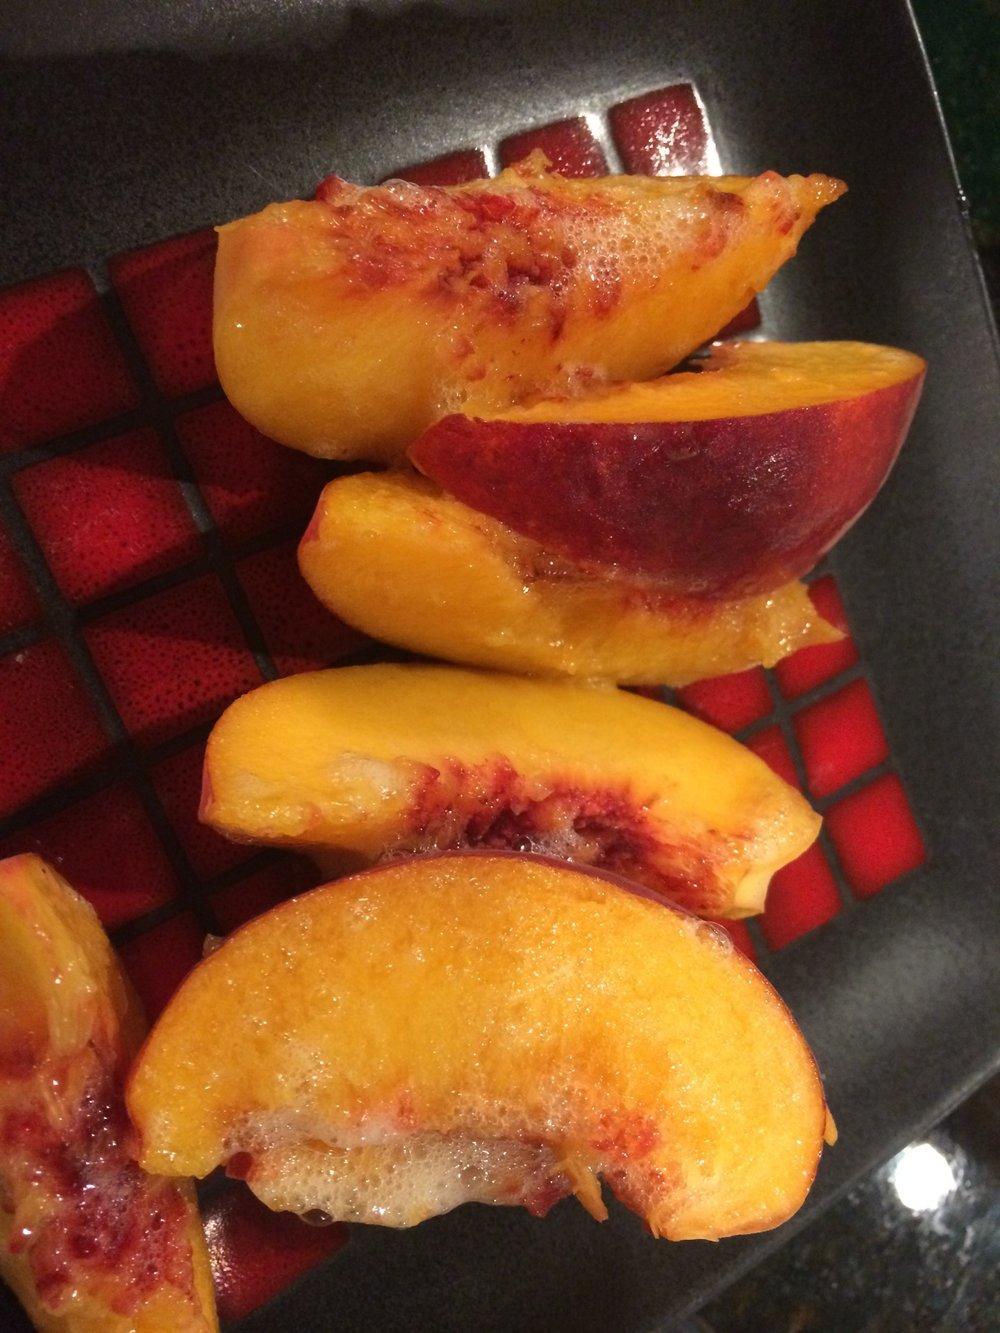 Fizzy peaches are especially good!